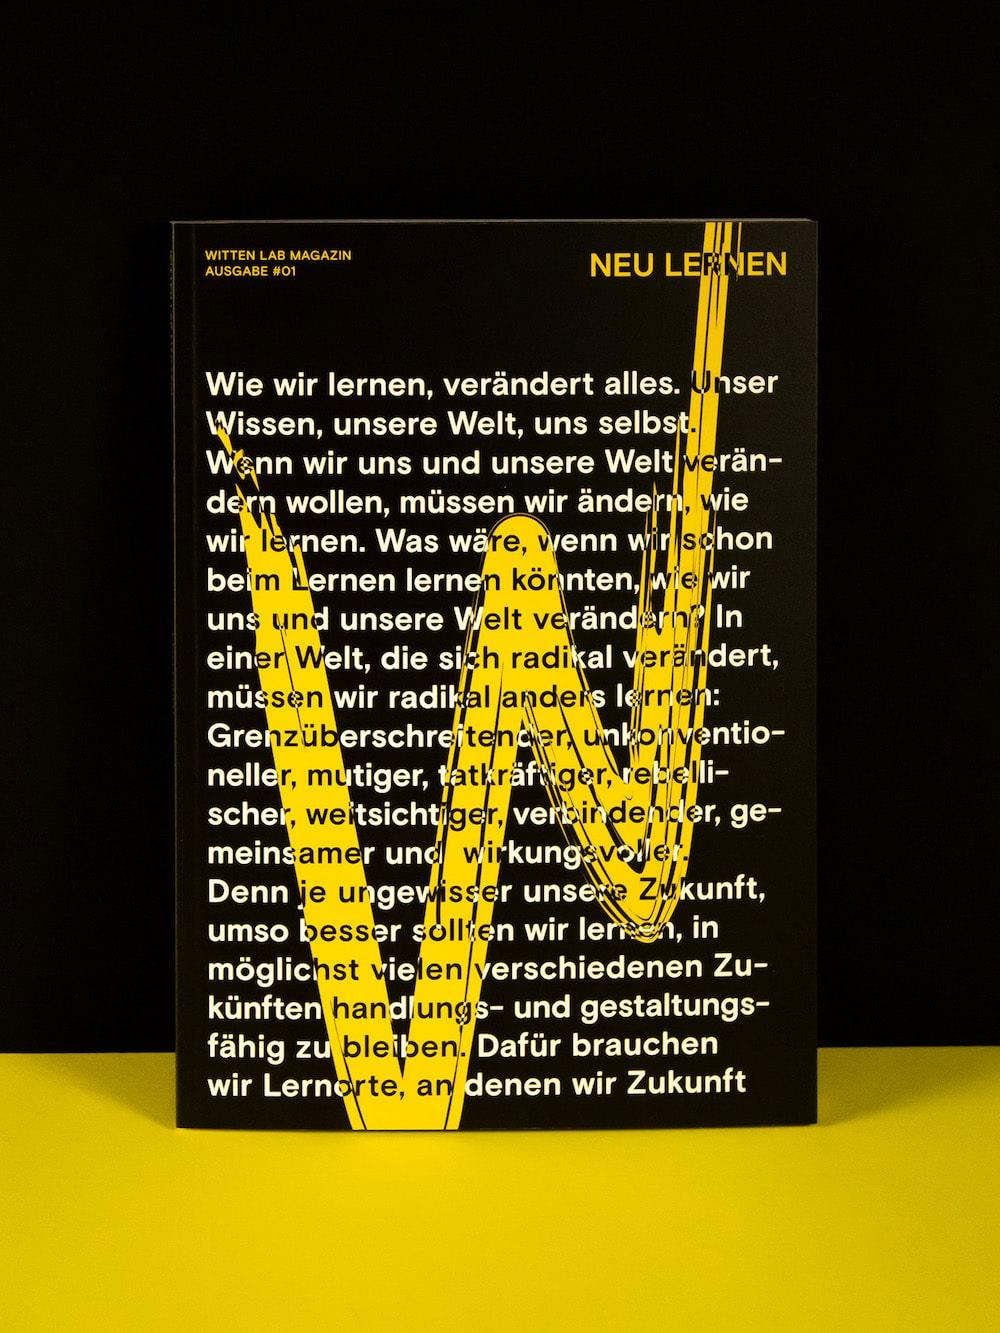 Witten Lab Magazin Cover